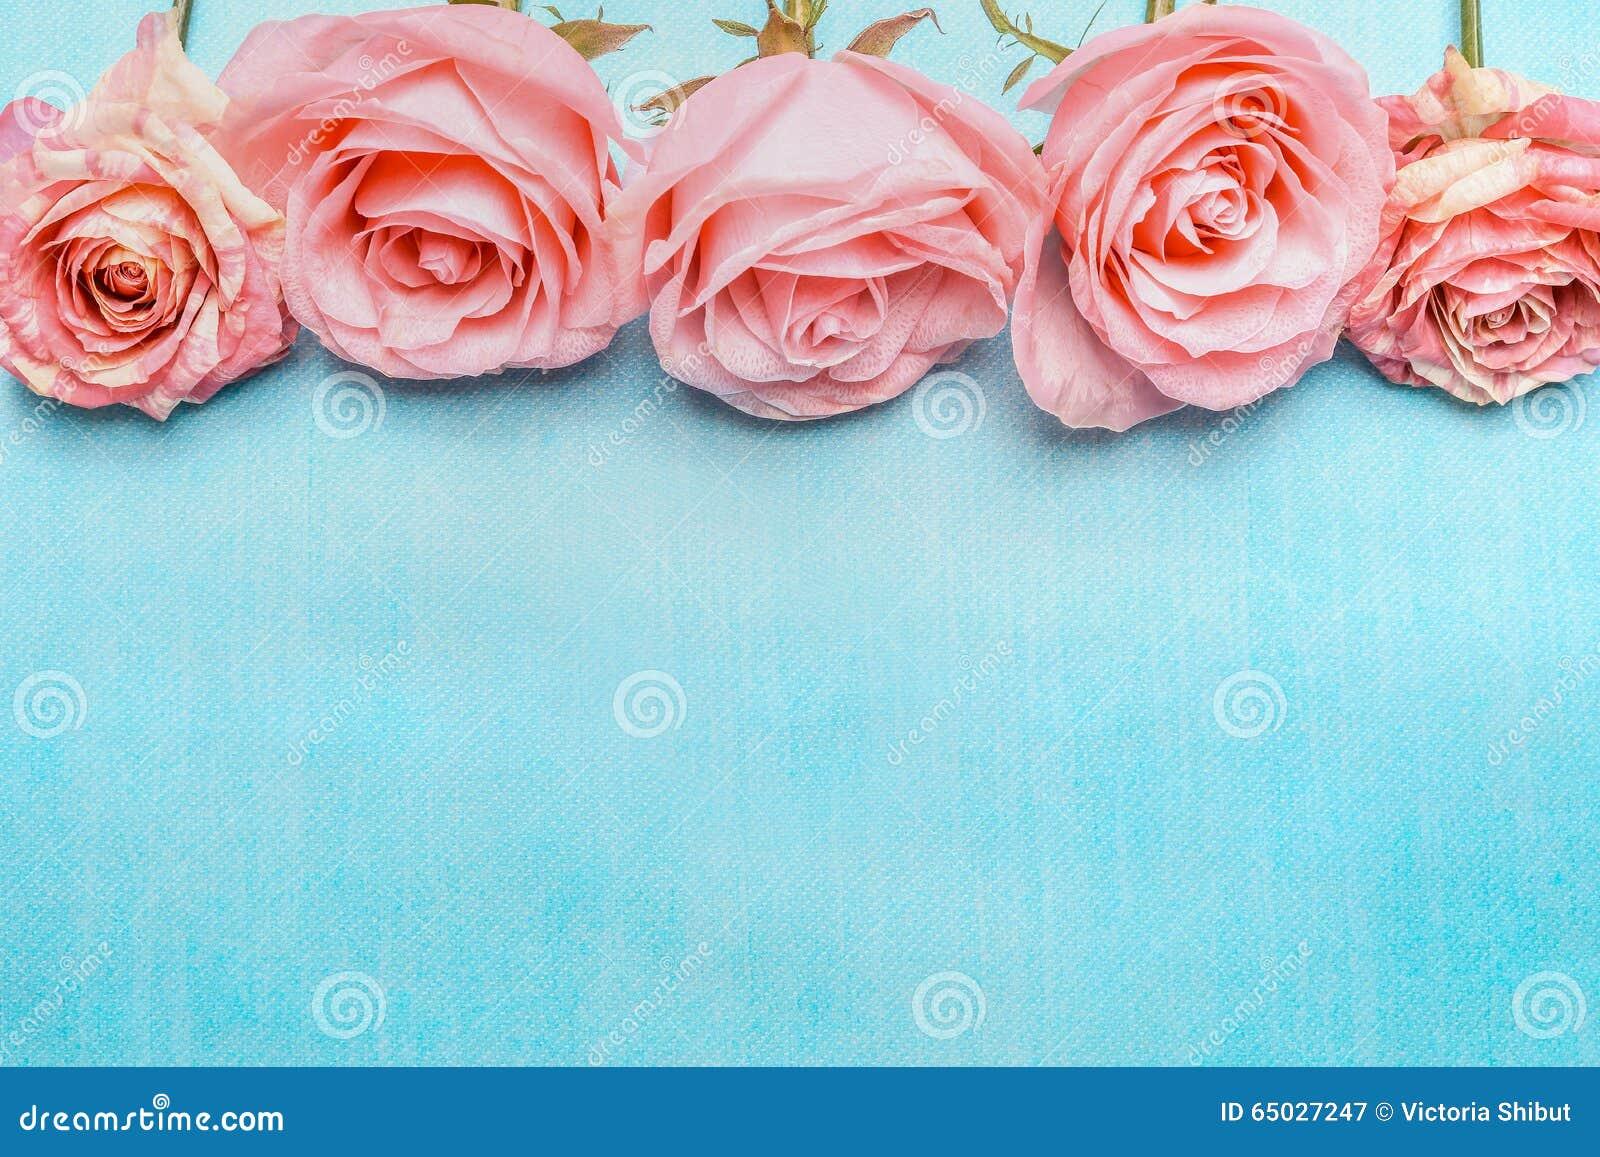 Pink pale roses border on blue background